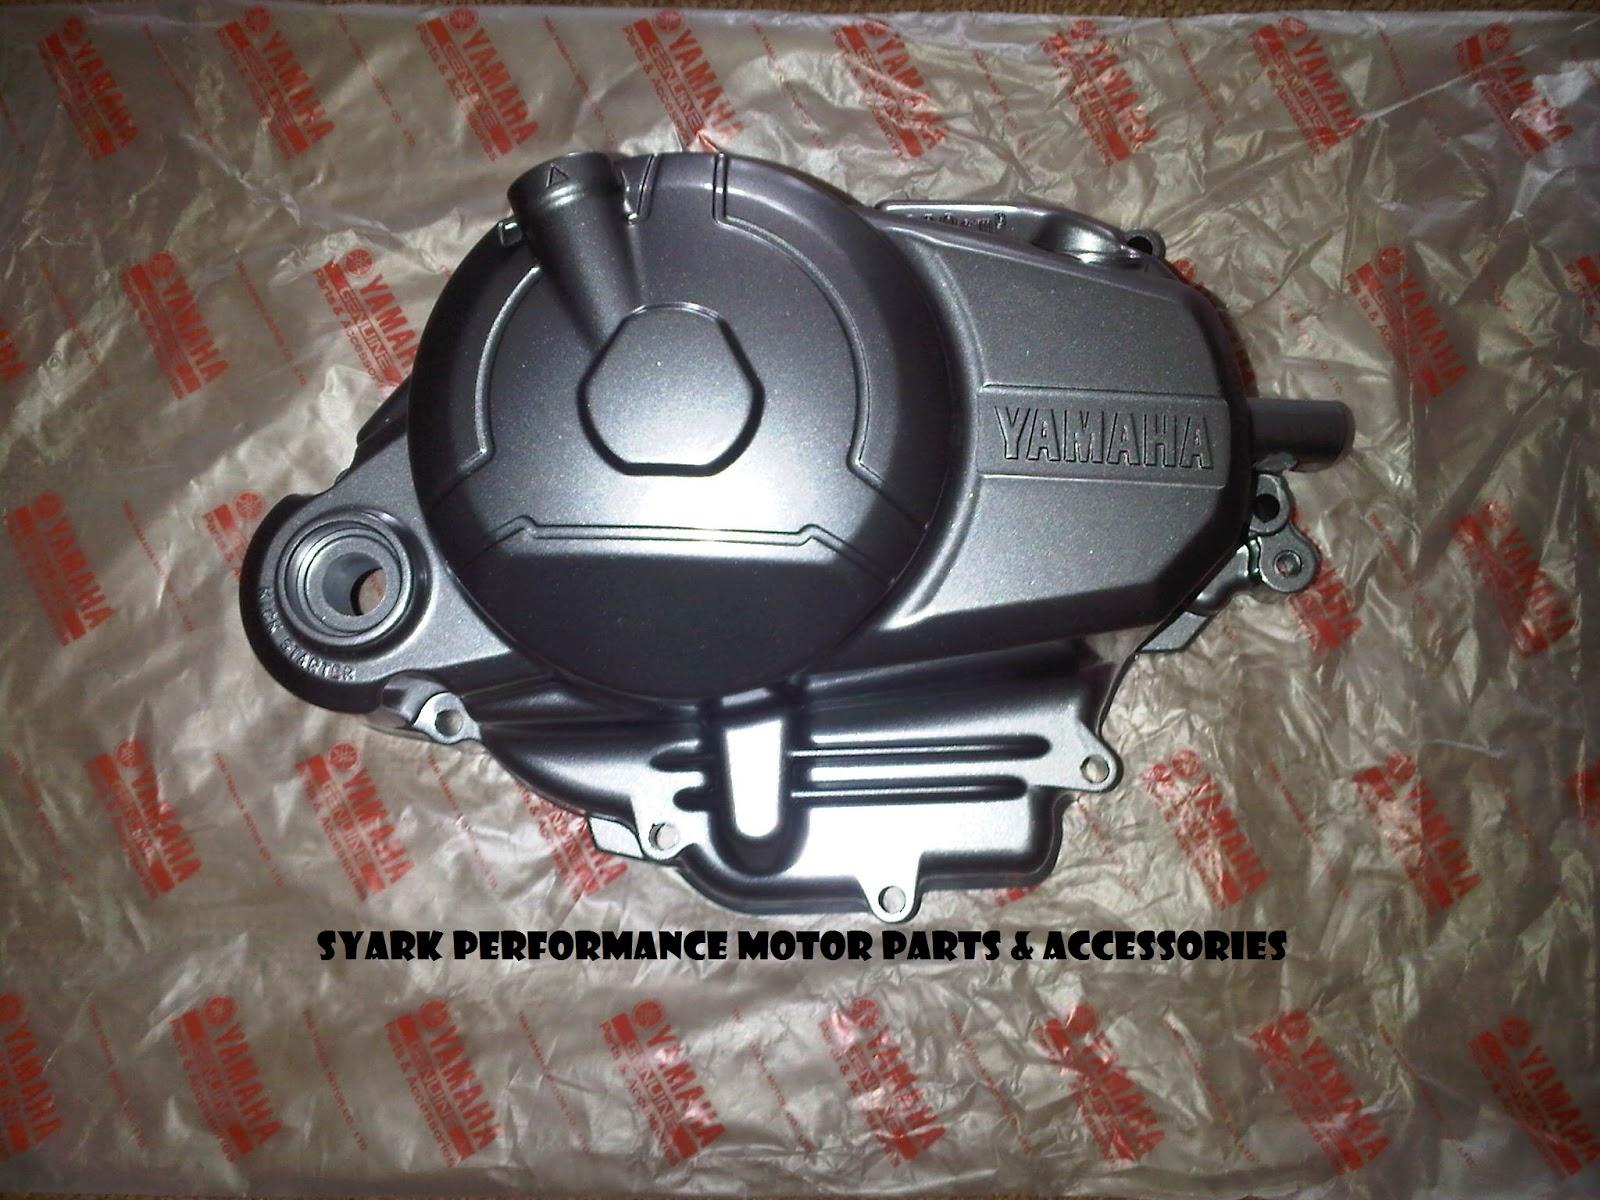 syark performance motor parts   accessories online shop  est since 2010  new yamaha genuine Yamaha Nouvo SX 2014 yamaha lagenda 110z manual